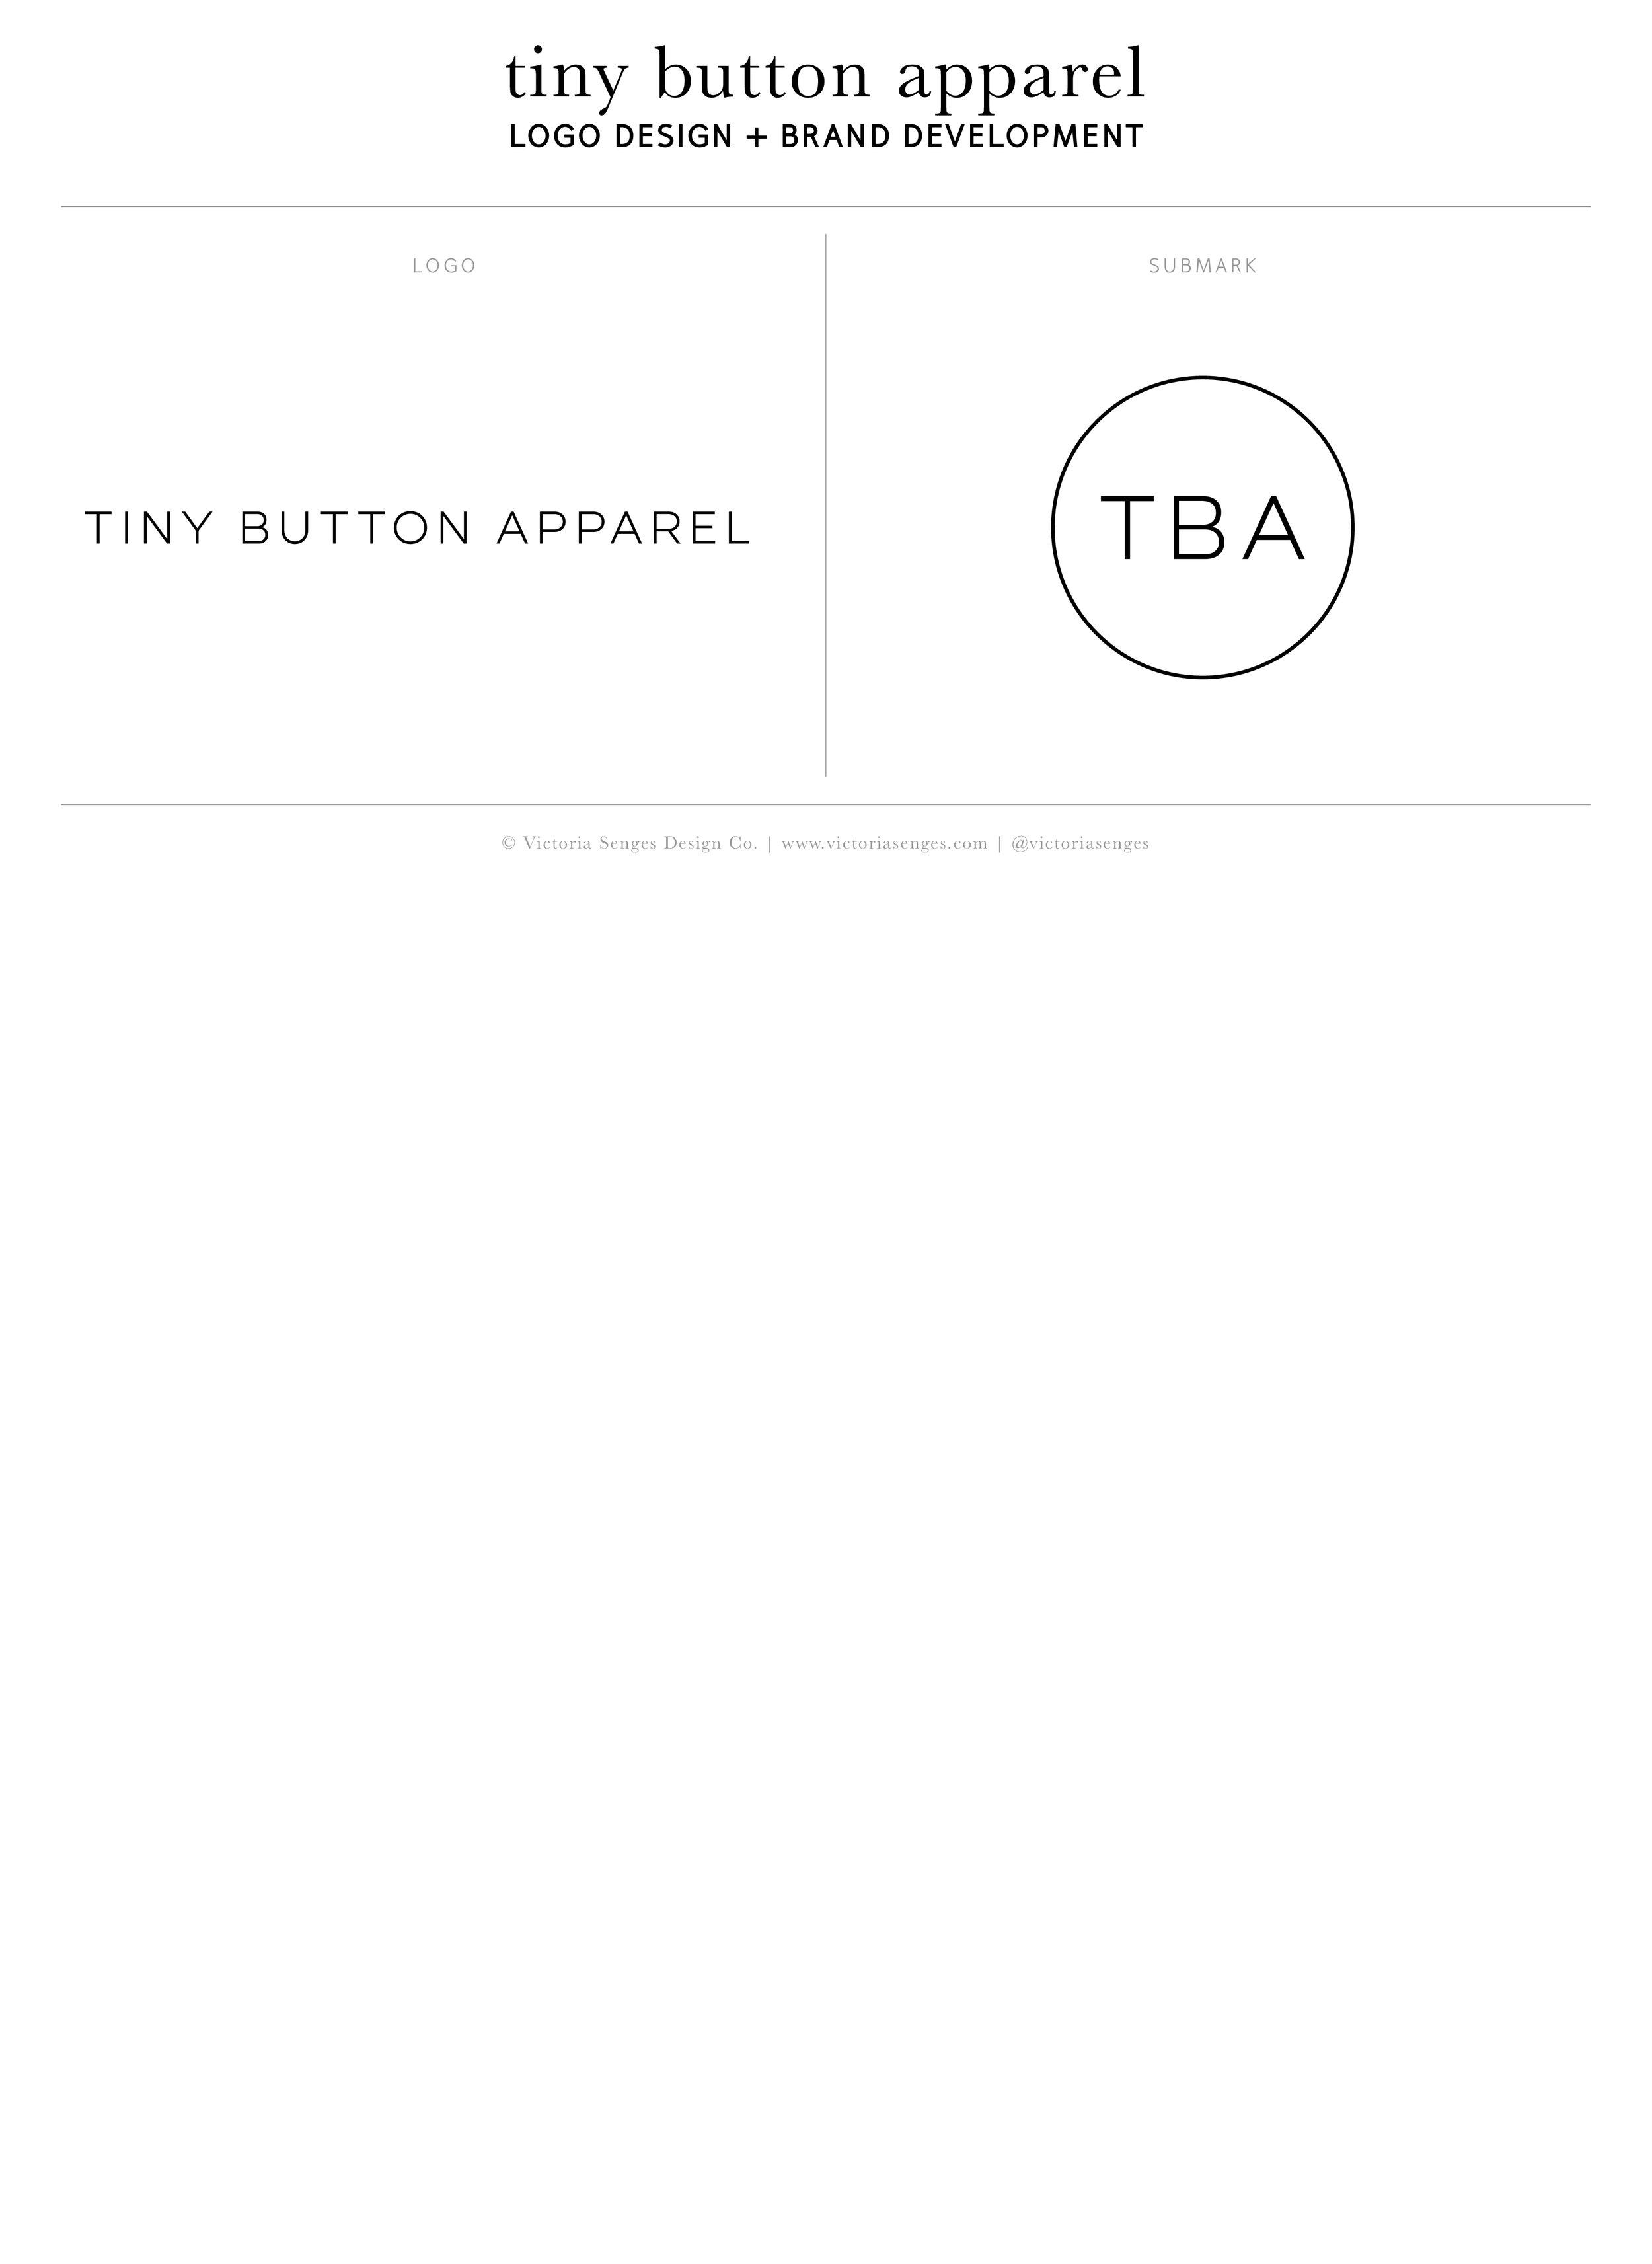 tinybutton-branding.jpg